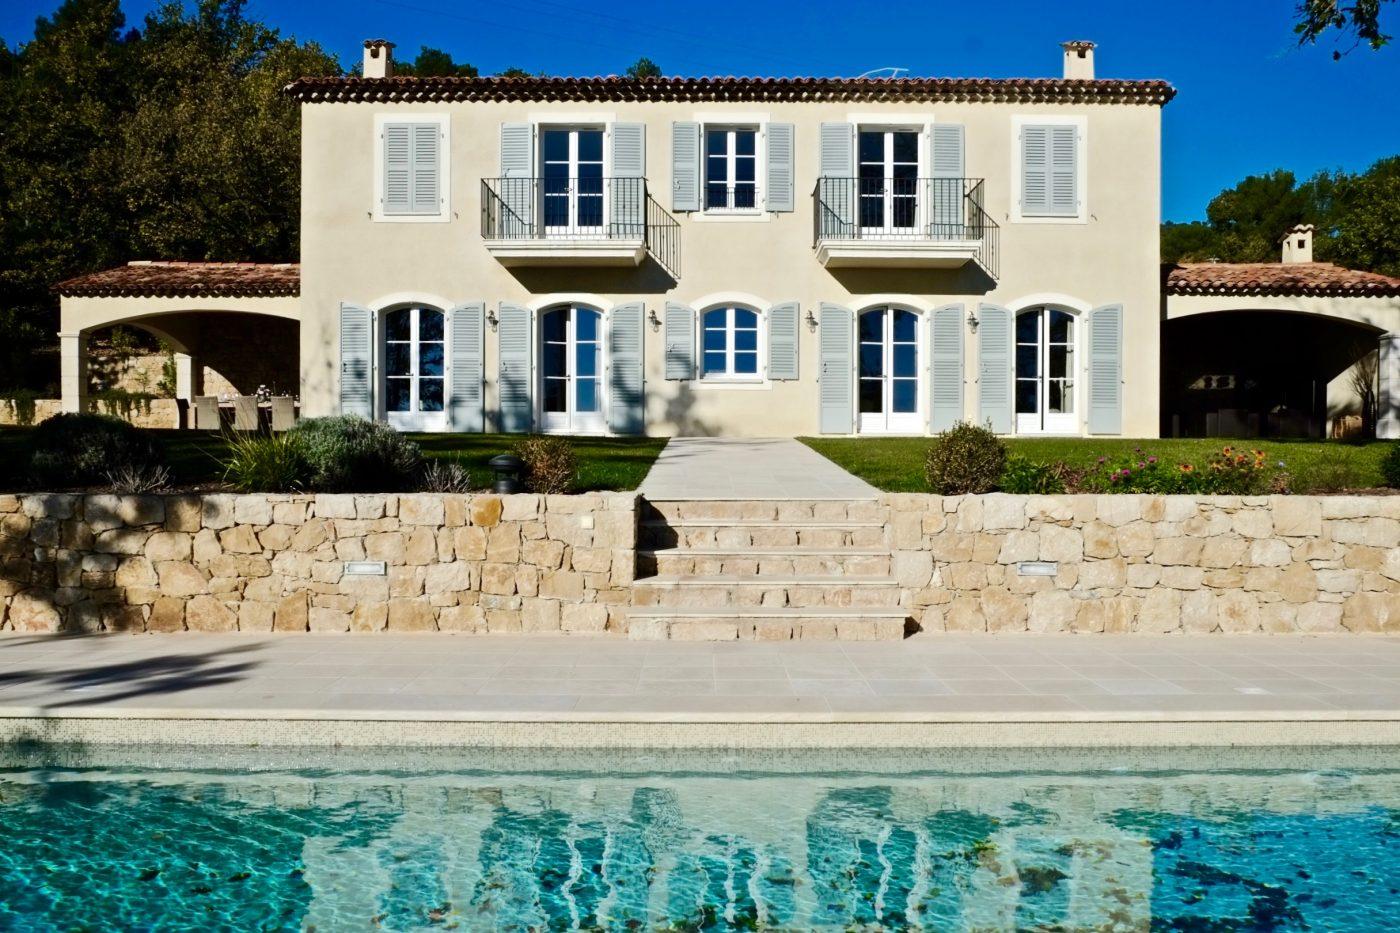 Maison De Fayence A Beautiful Villa In Provence France To Sleep